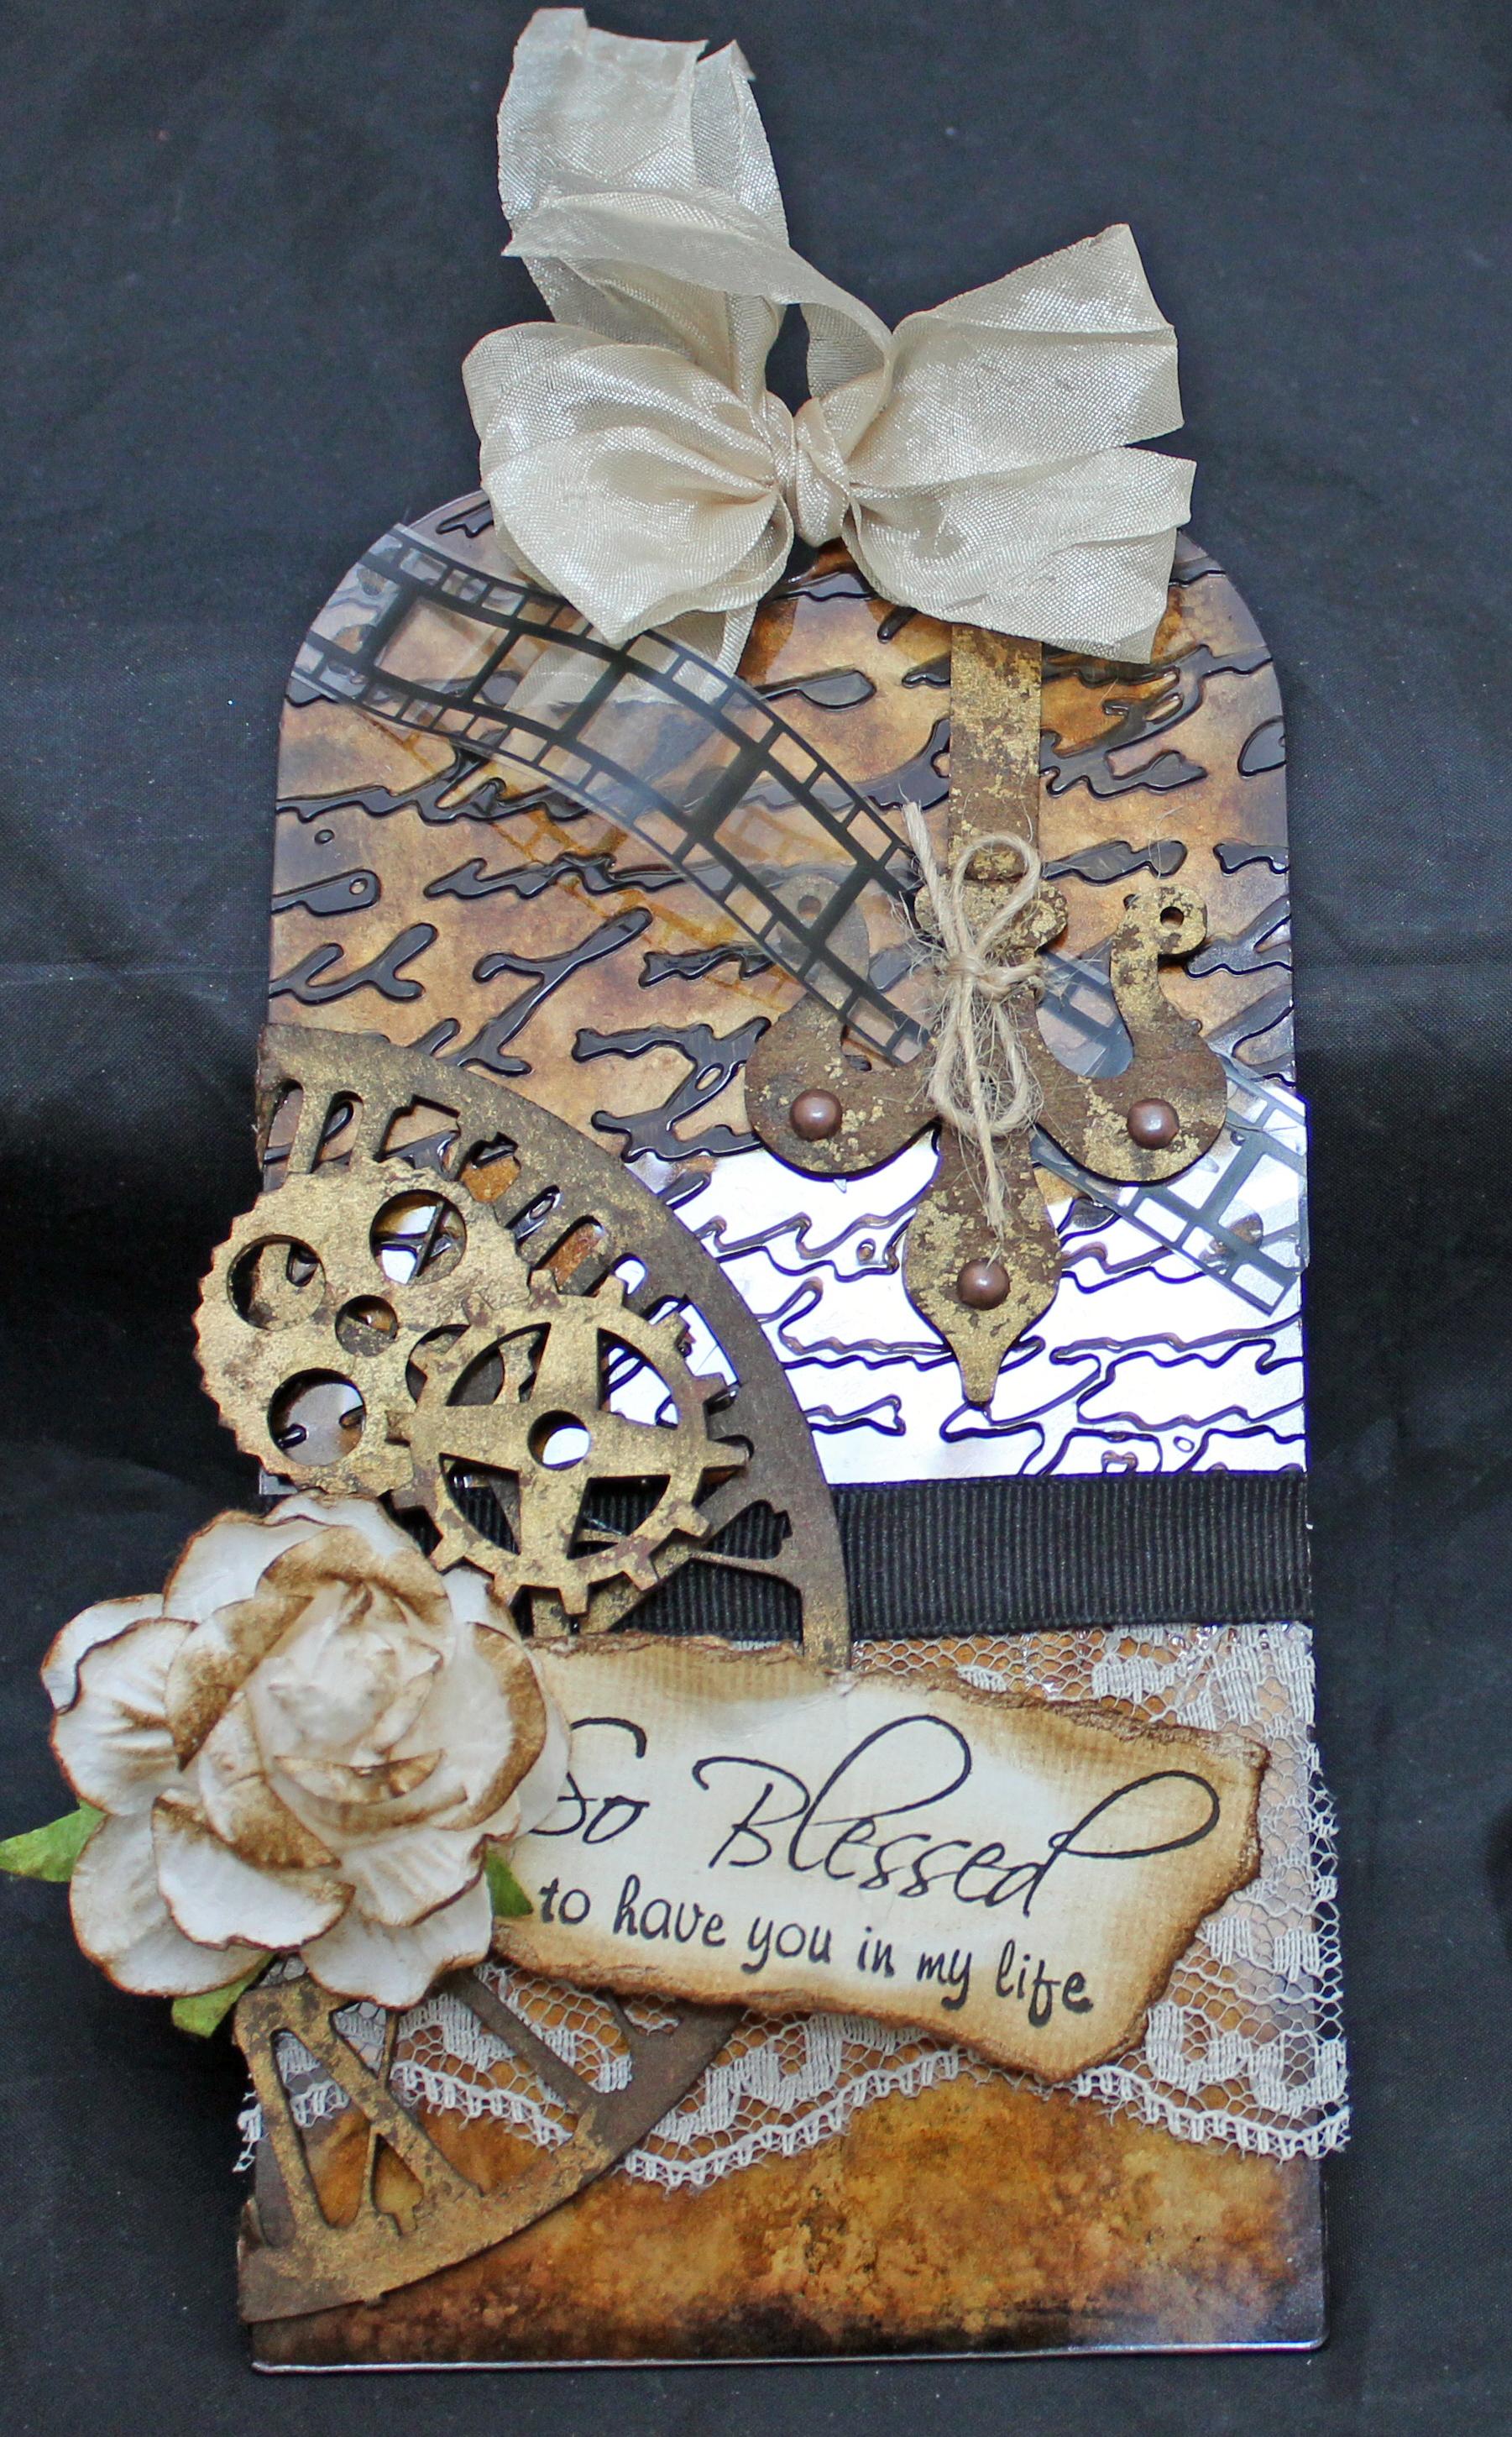 Tattered Leaf Chipboard Embellishments Chipboard Shapes Scrapbooking,Embellishment,Ephemera Mixed Media Chipboard Leaf Cardboard leaf